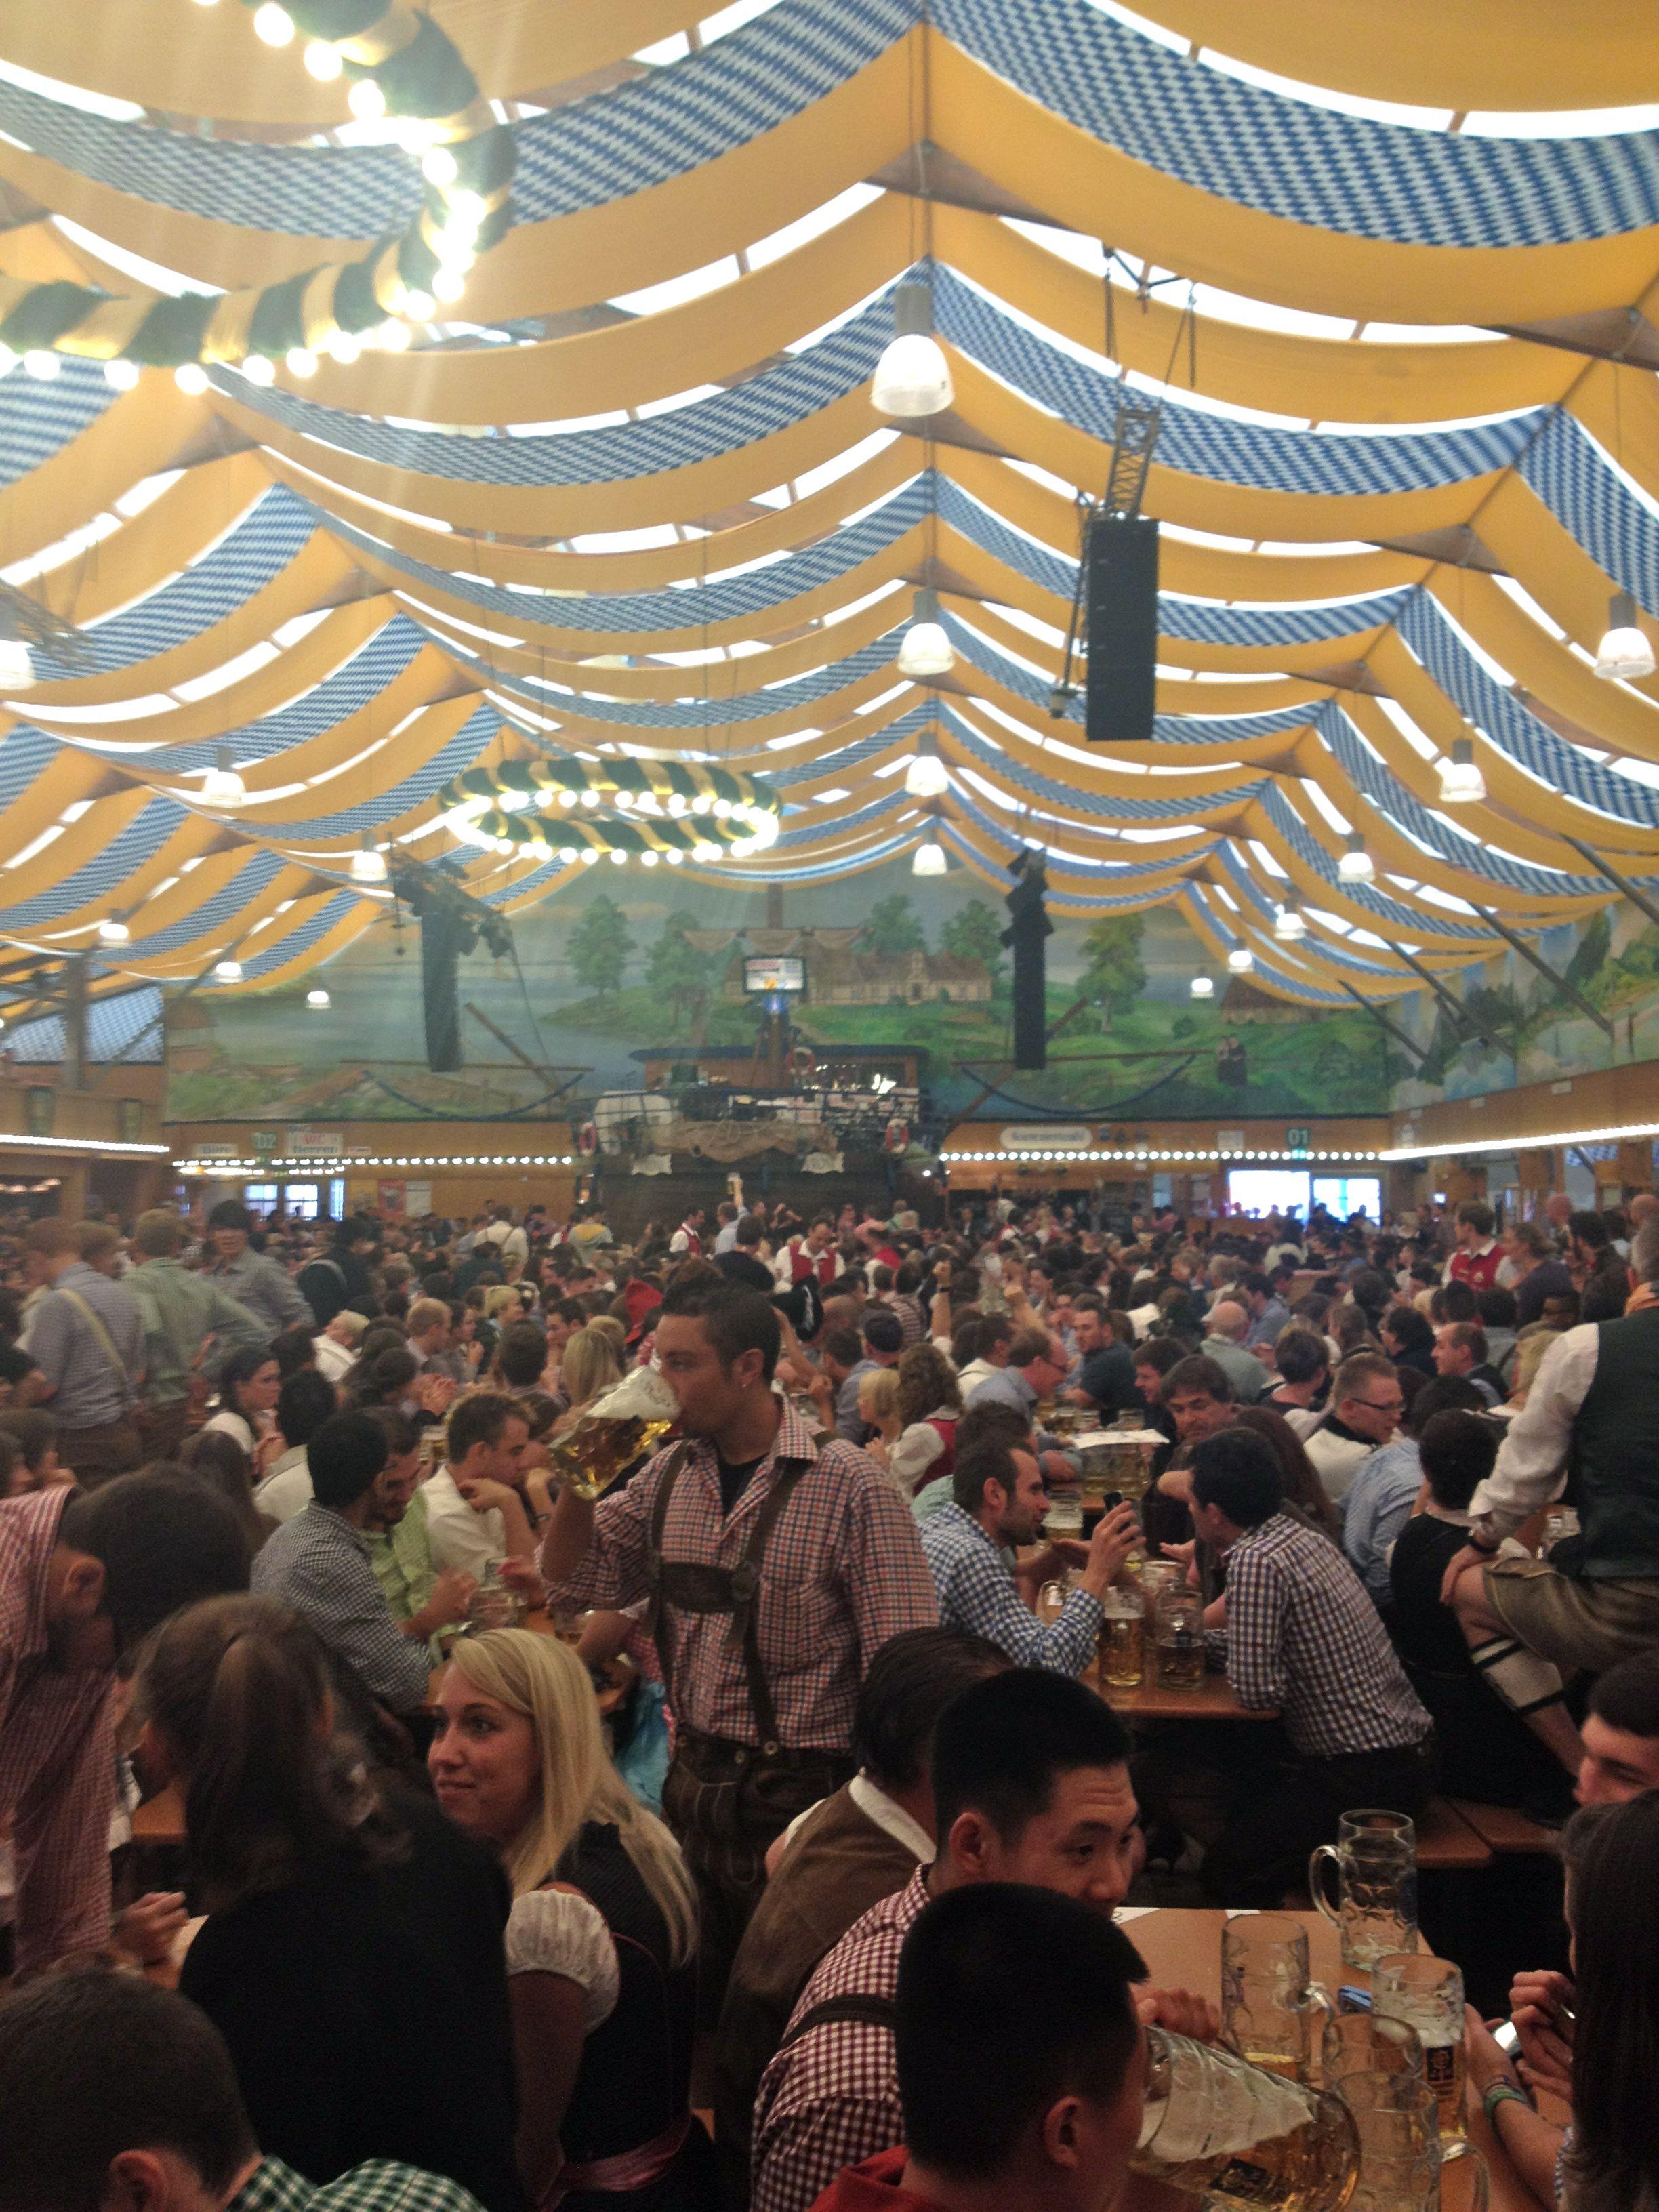 Oktoberfest - Munich, Germany | Places I've Been ...